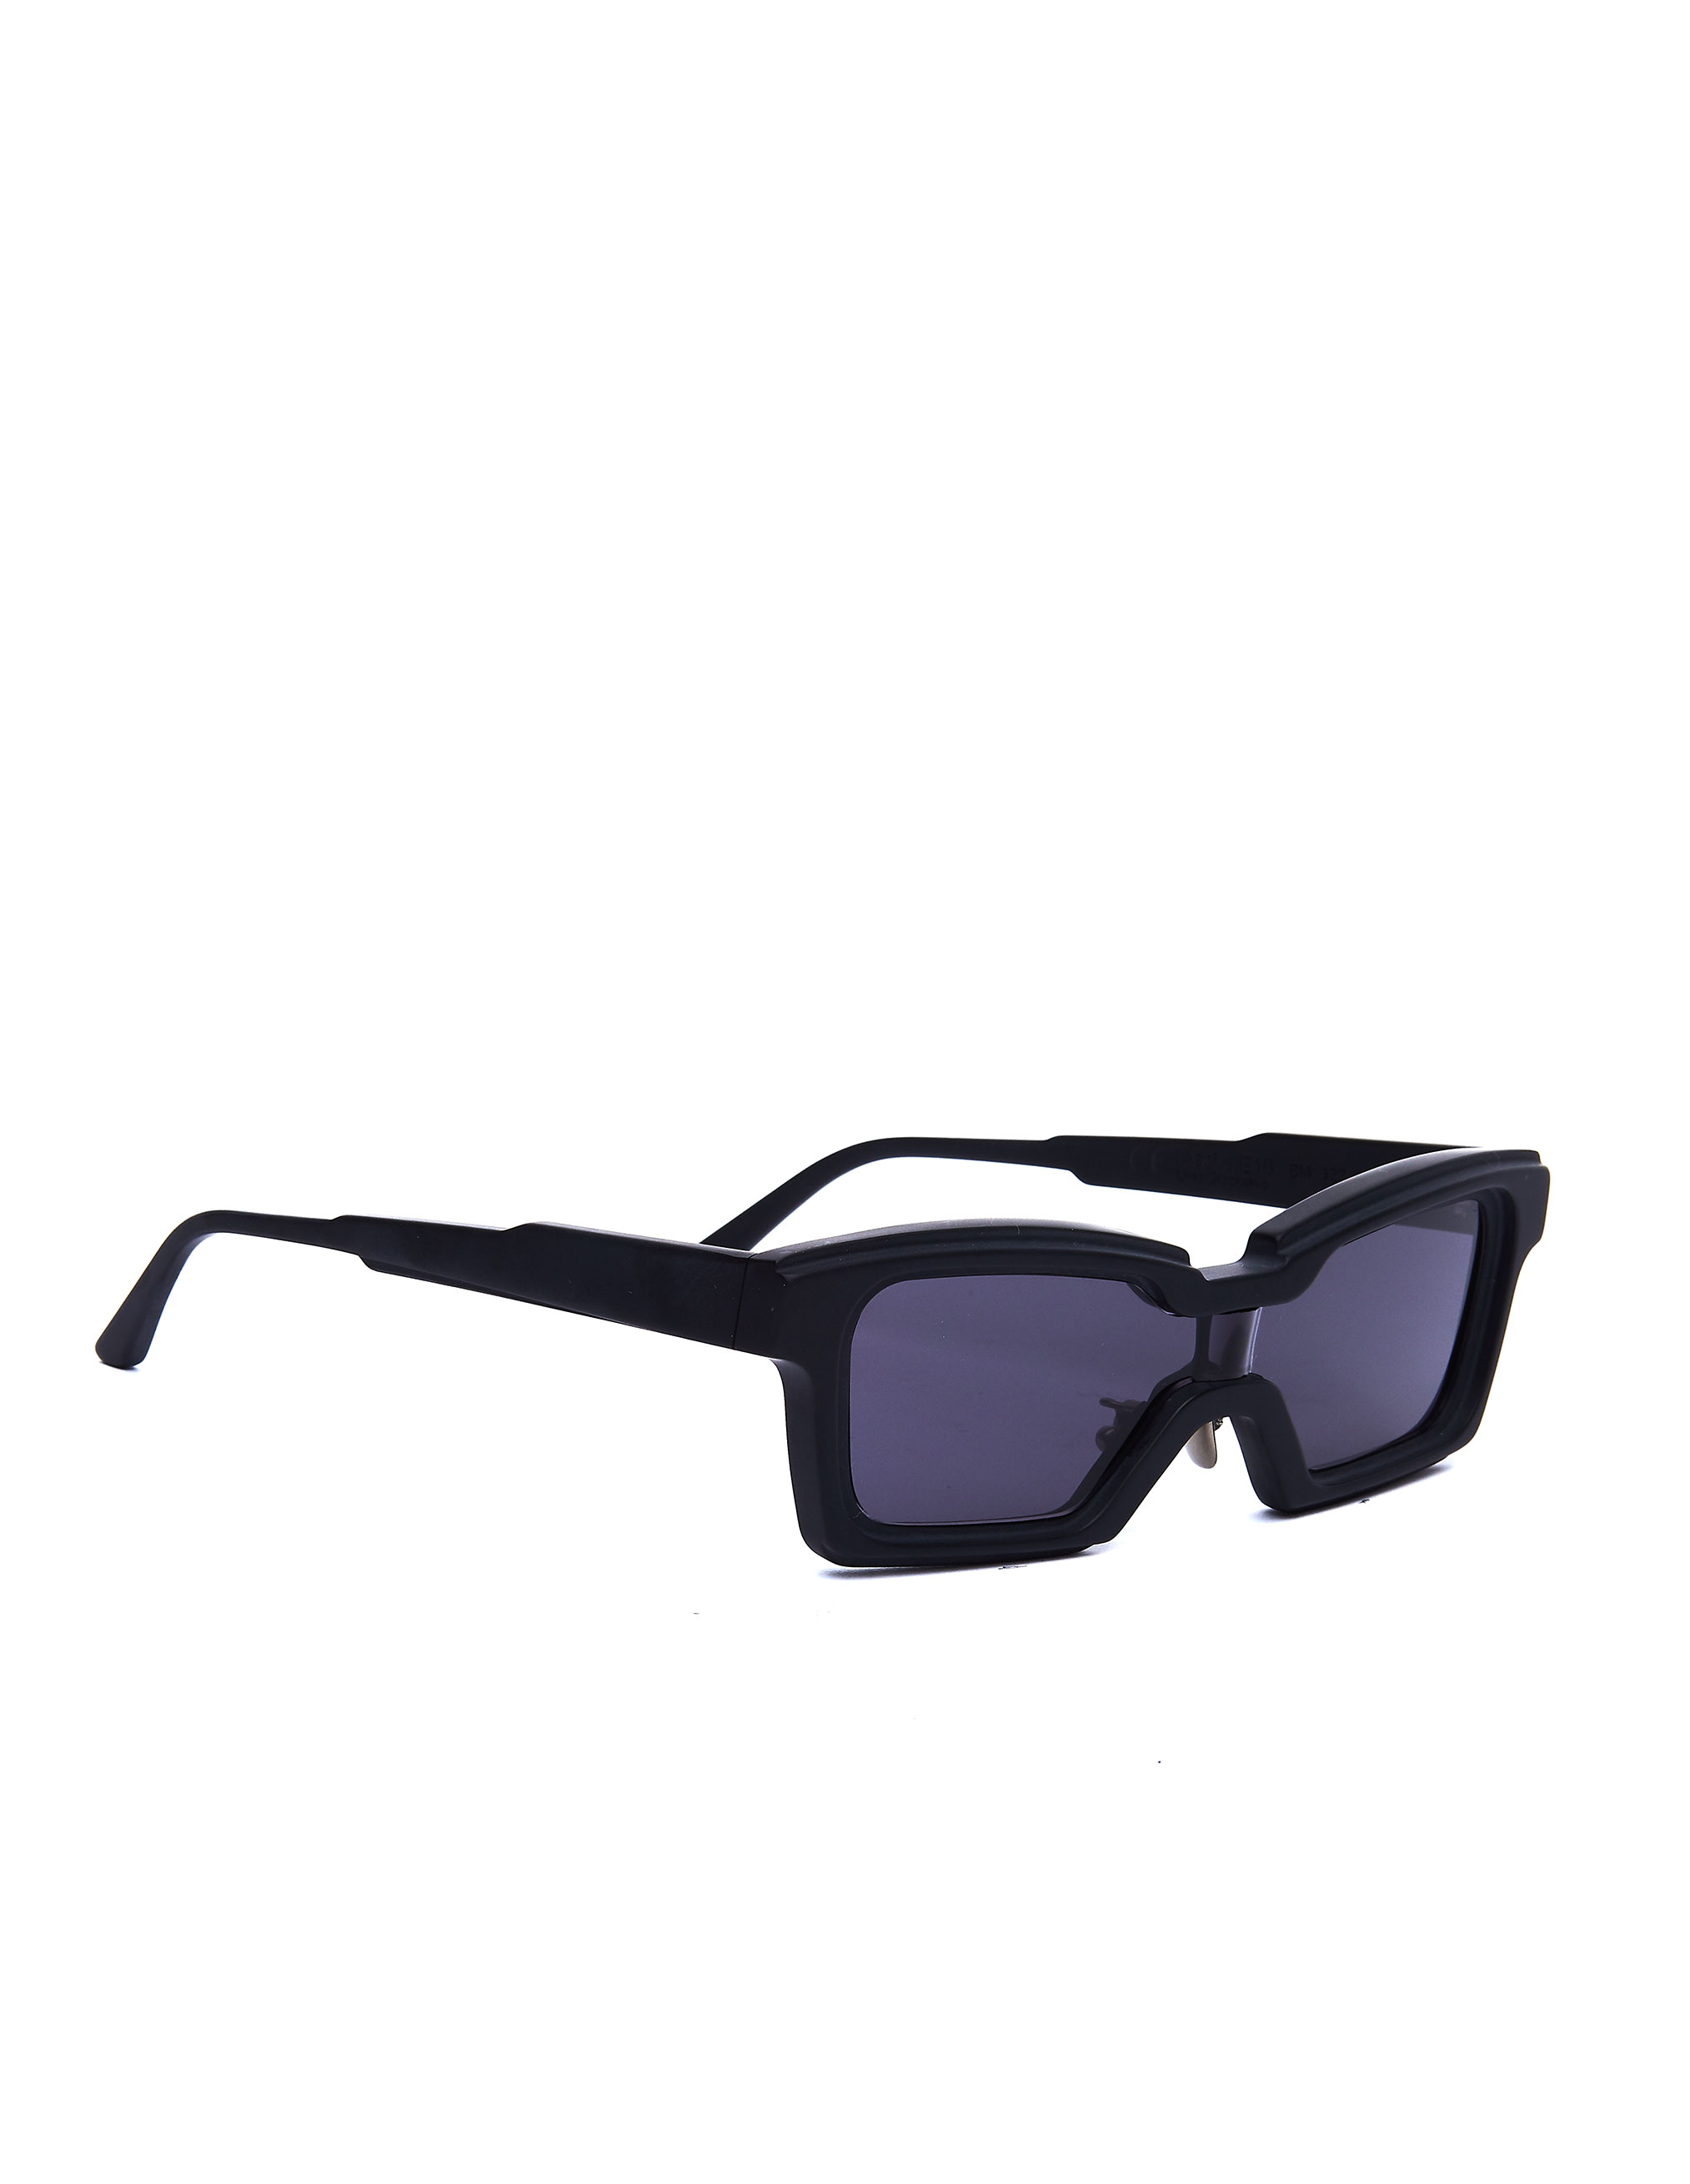 Kuboraum Mask E10 Sunglasses